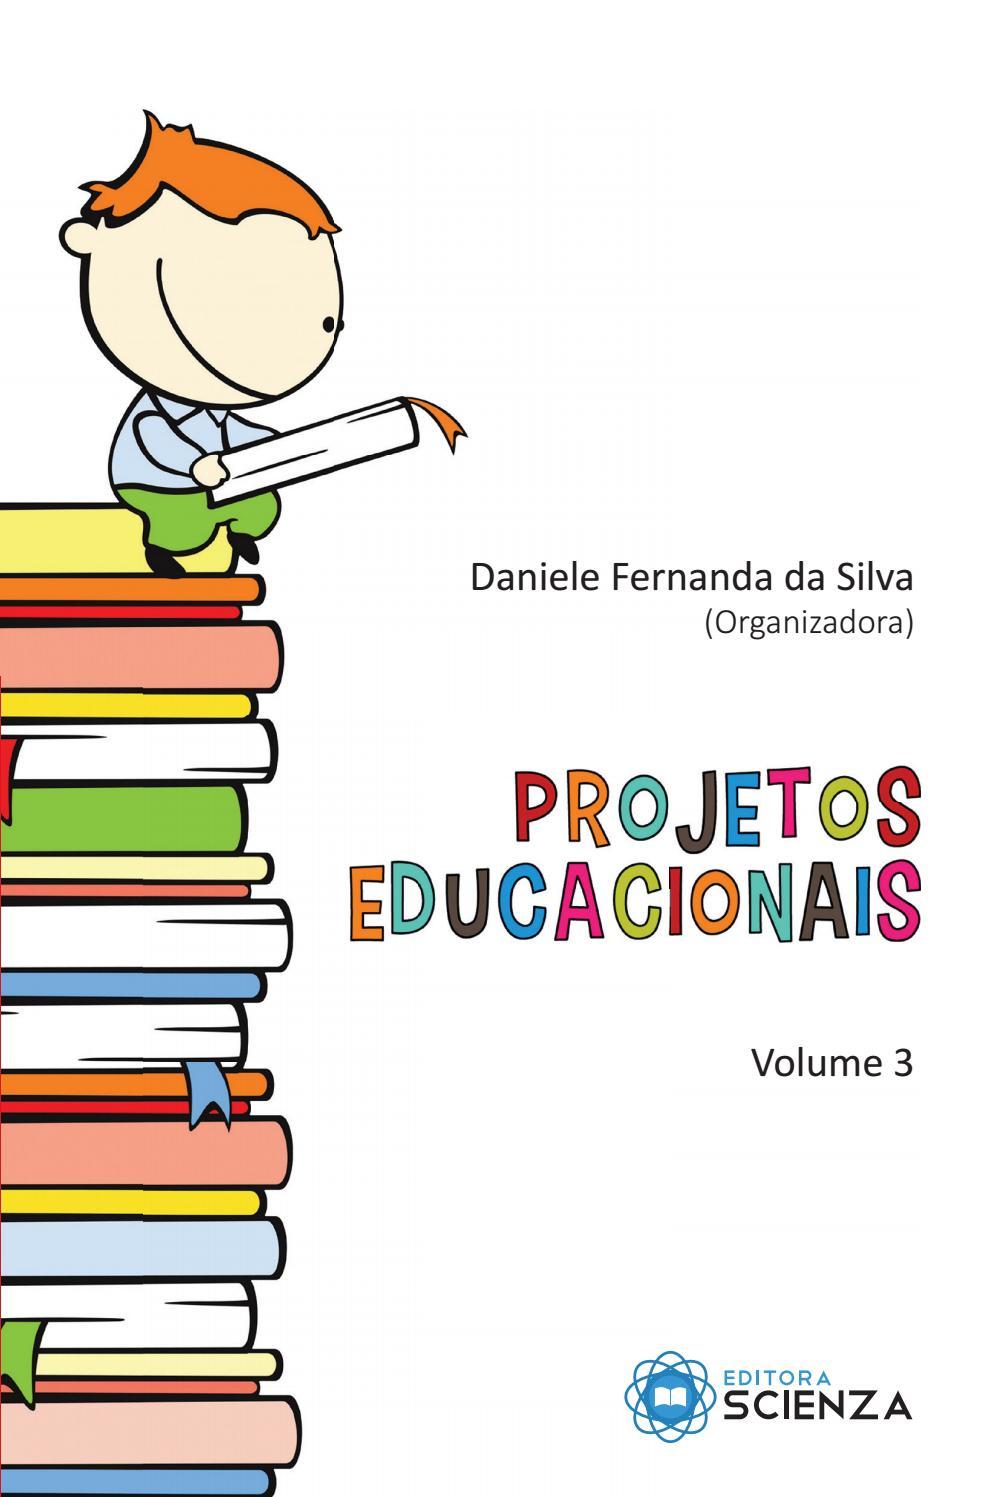 Projetos Educacionais Volume 3 By Editora Scienza Issuu